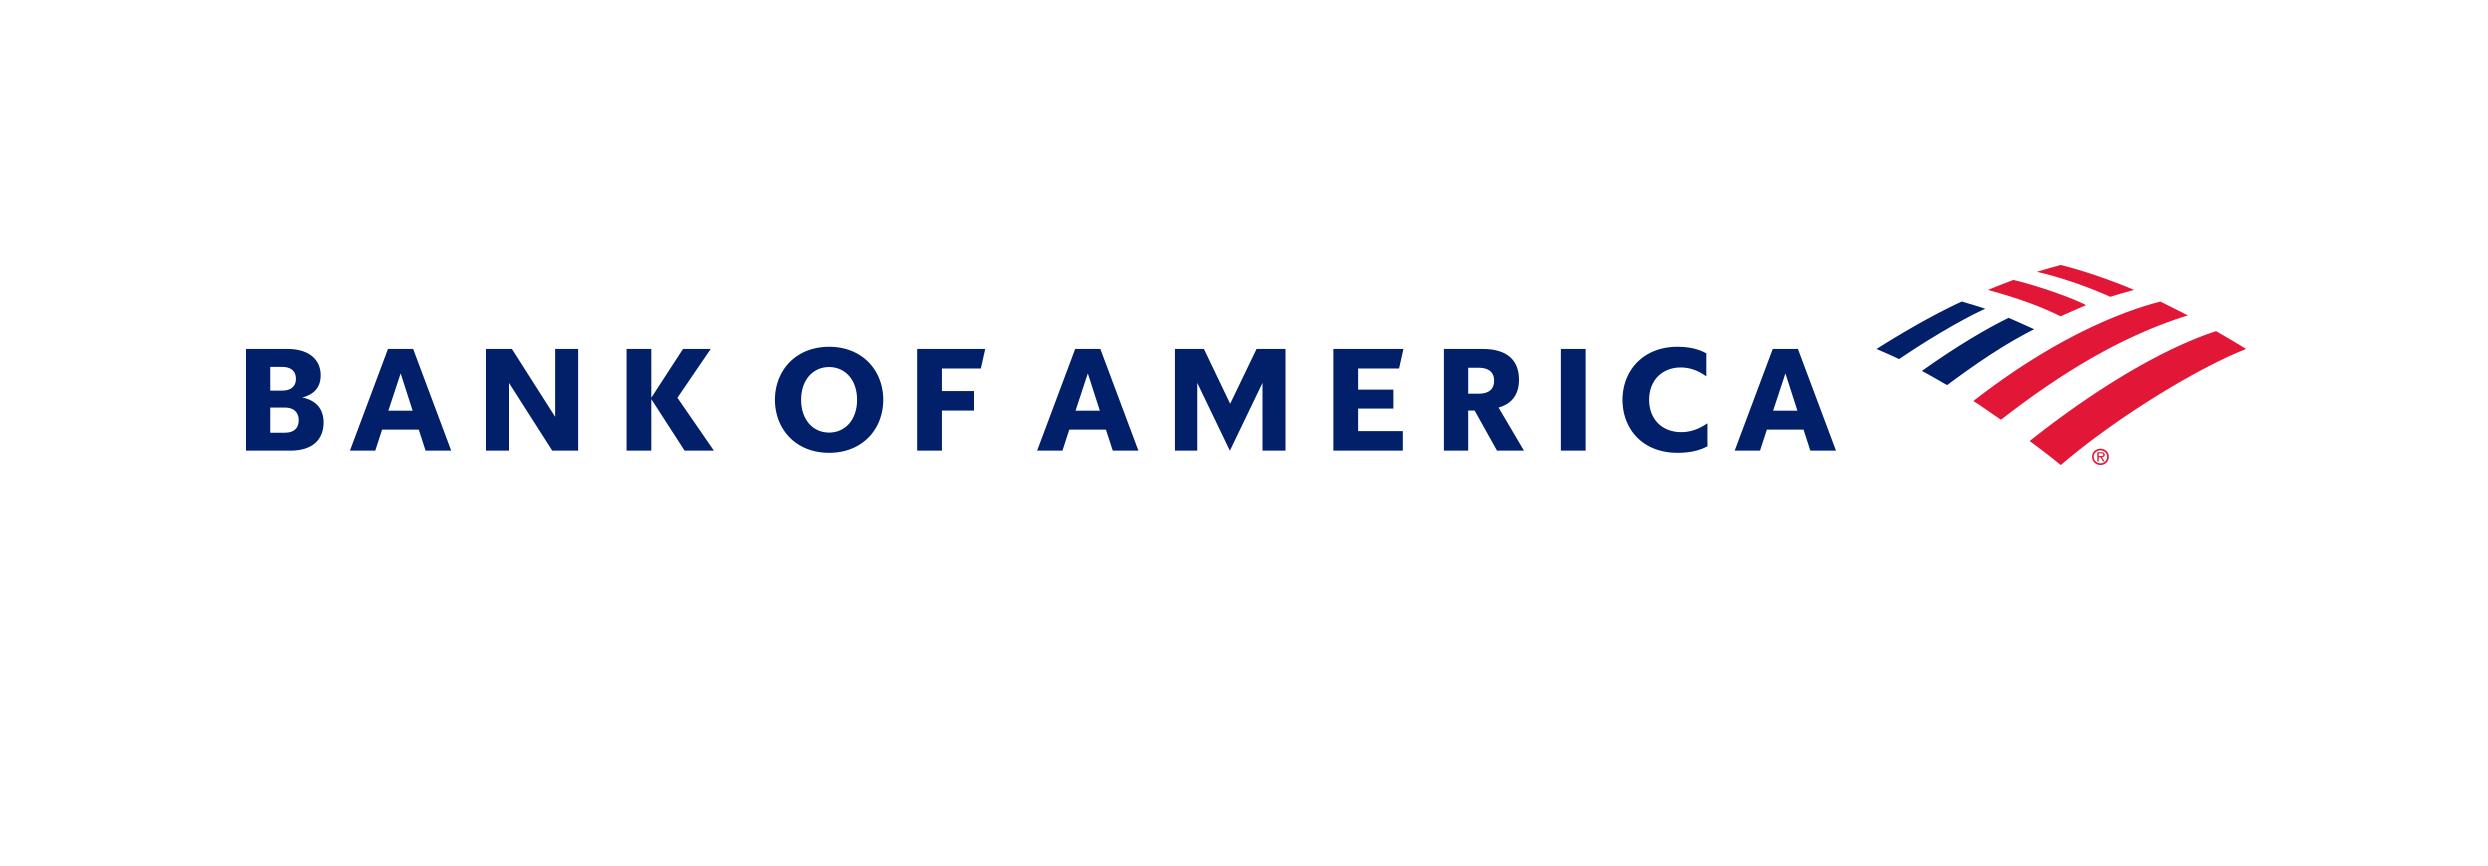 Bank of America Personal Loan Alternatives.